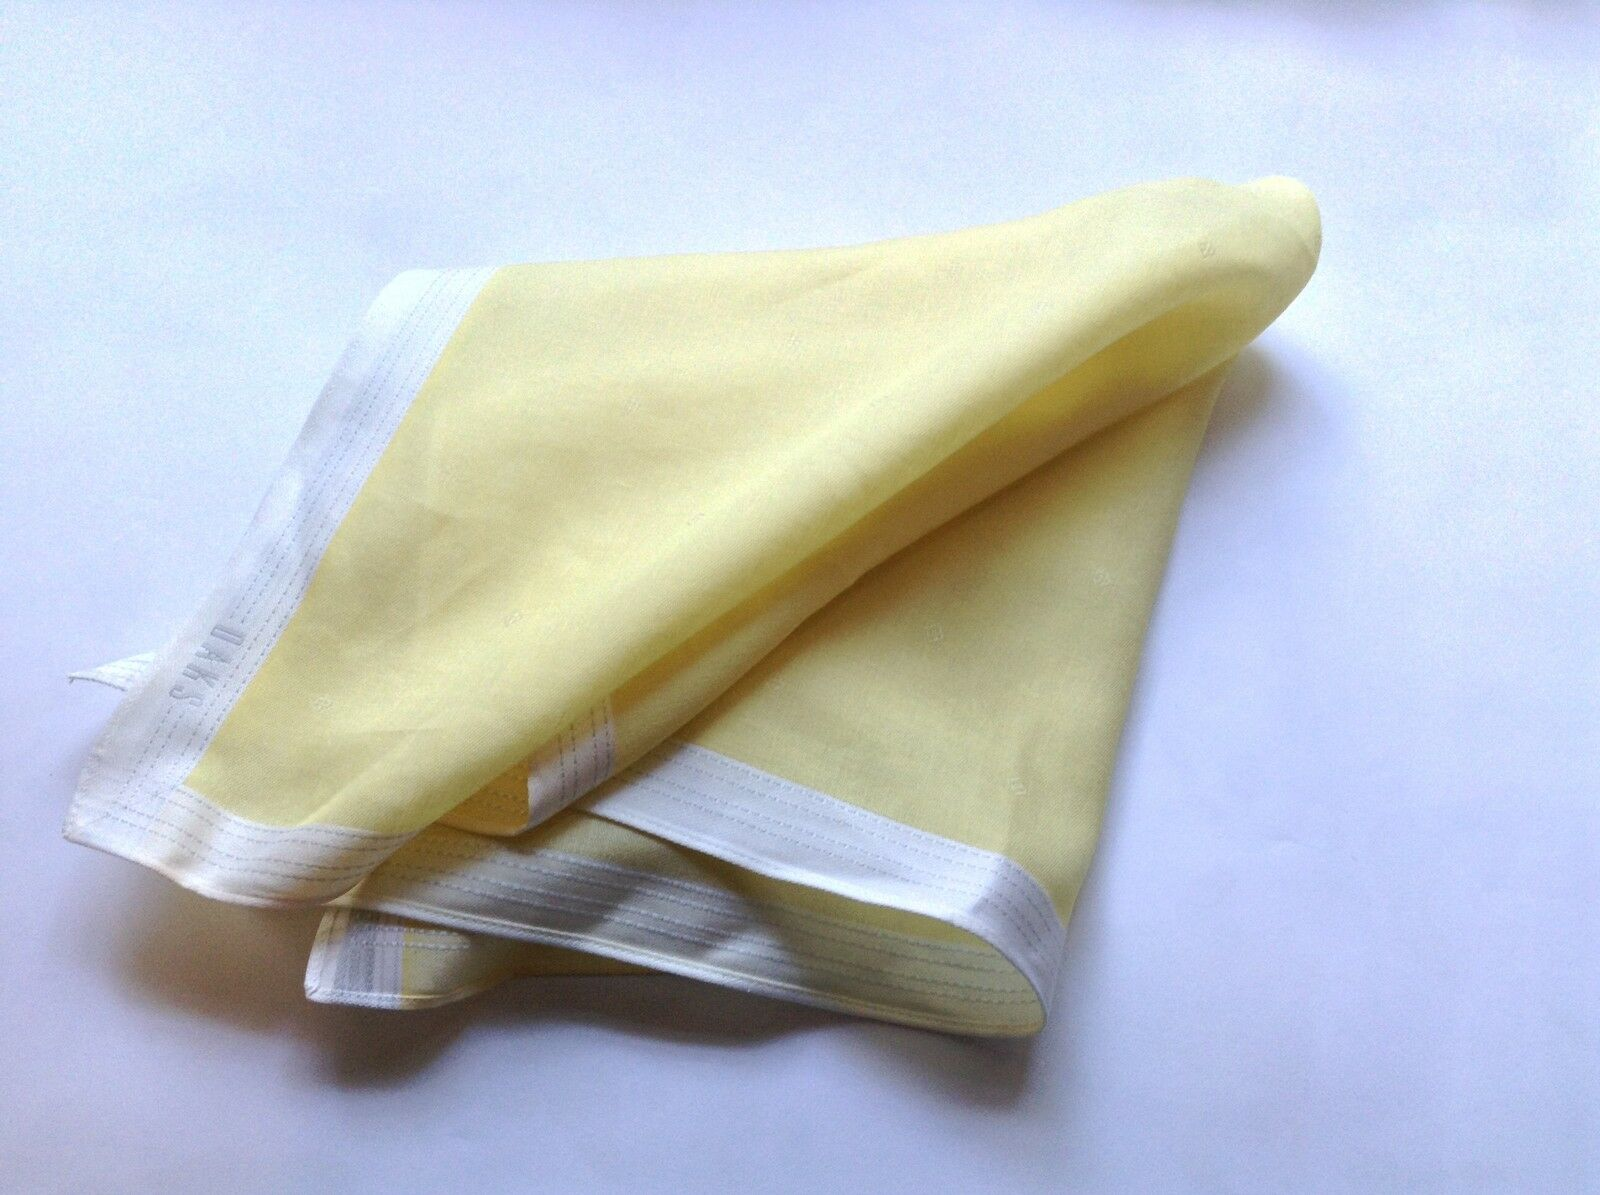 DAKS Men's handkerchief, pocket square finest 100%Cotton Light yellow and white